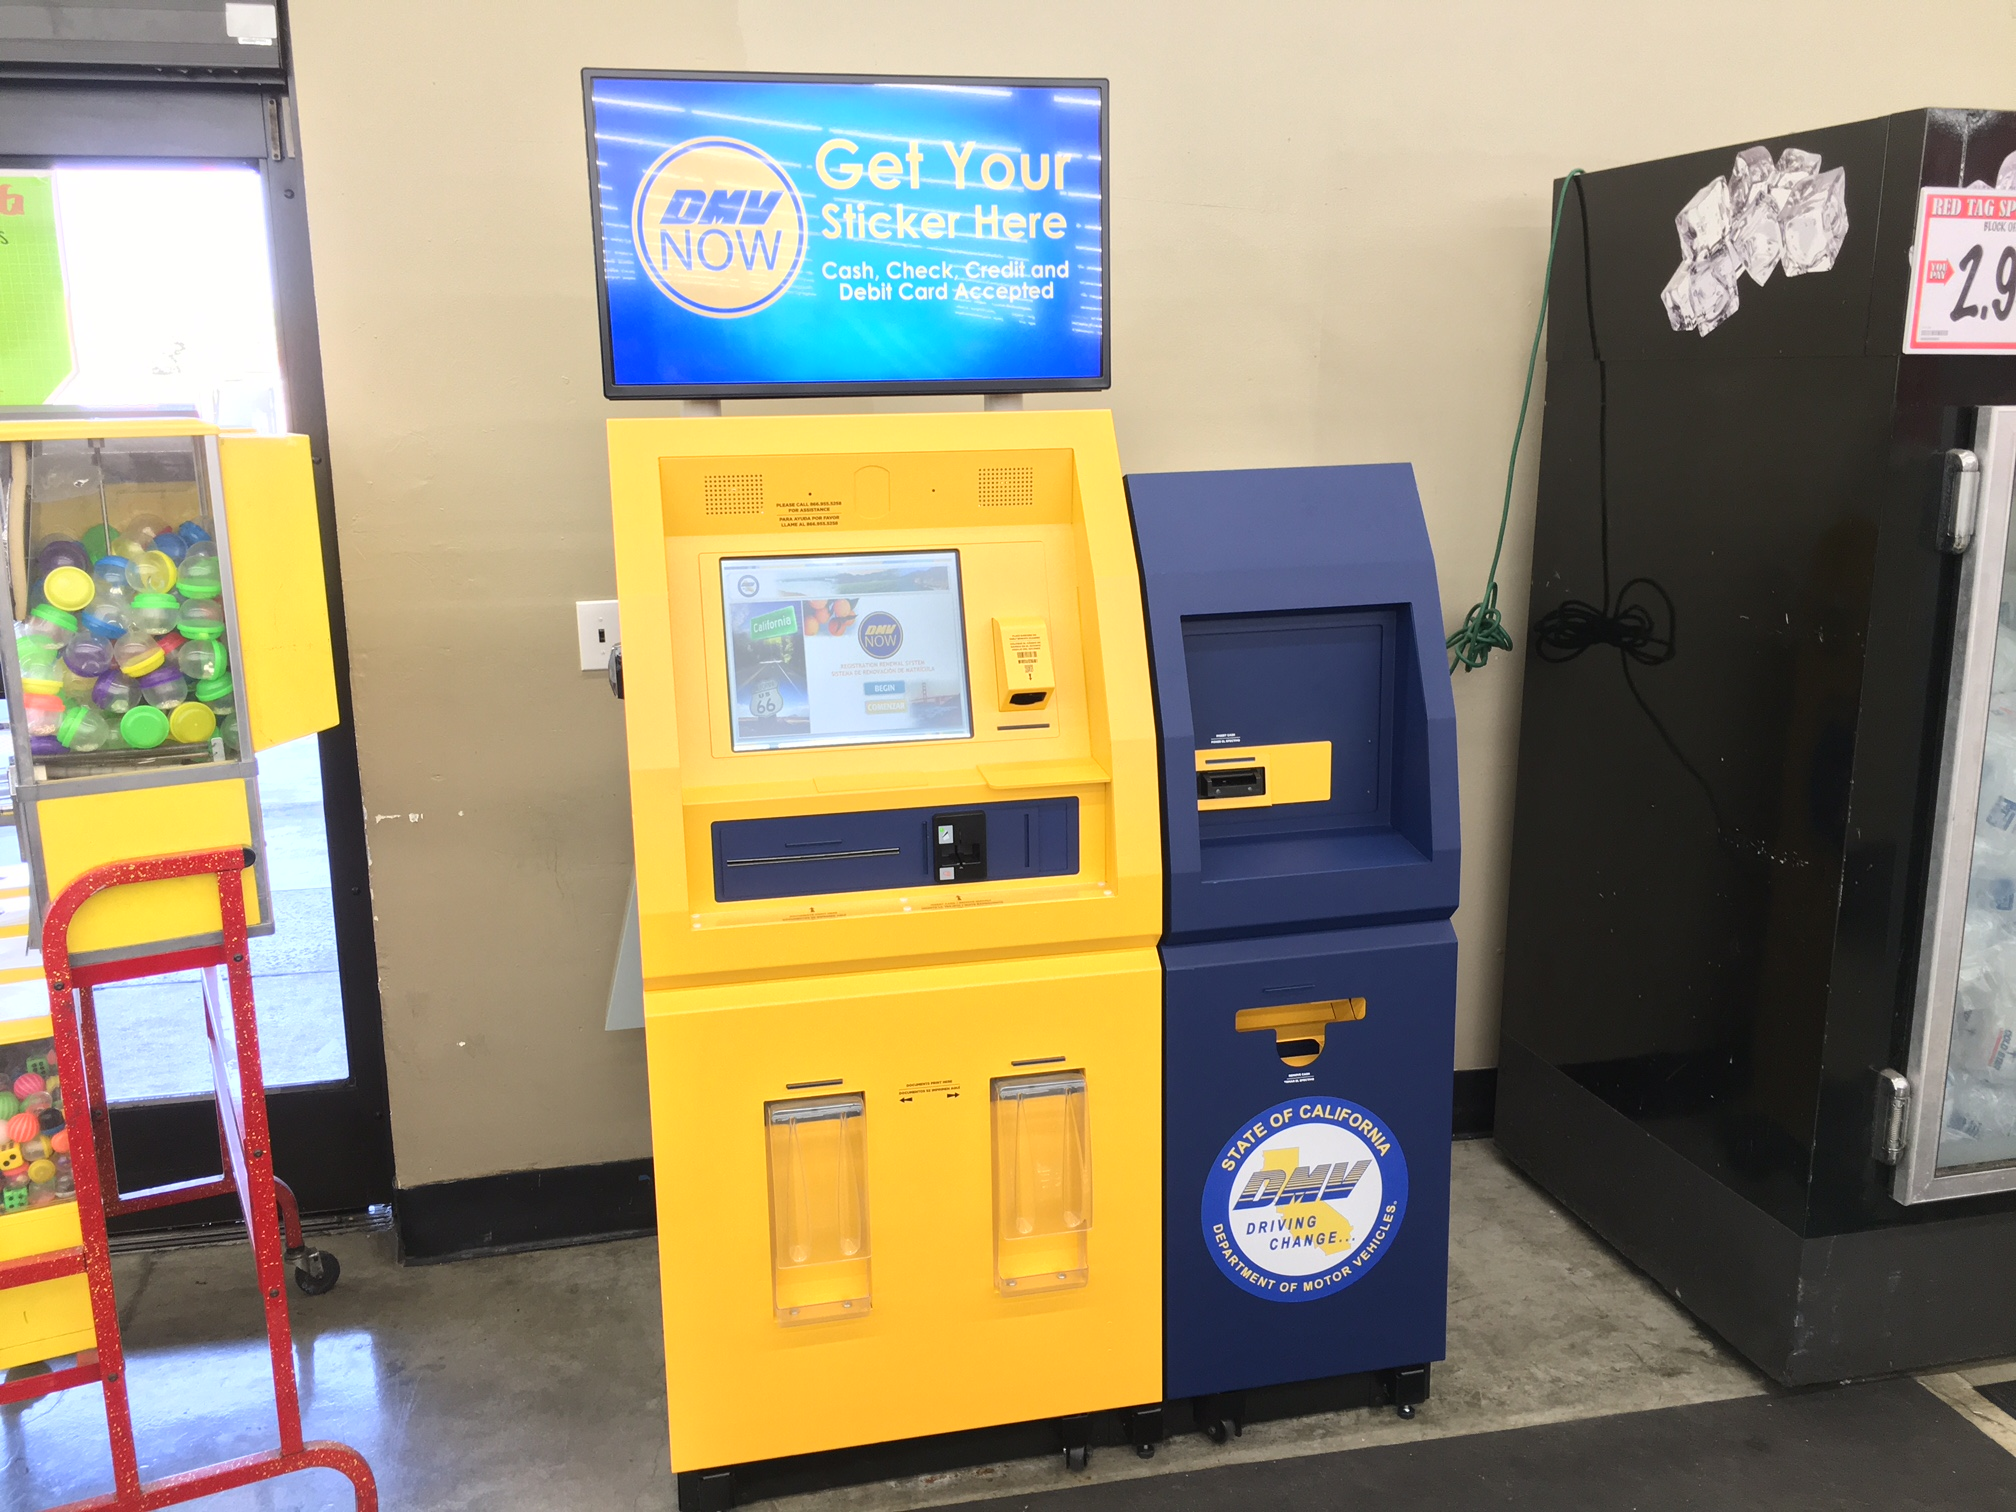 100th DMV Now kiosk installed at California DMV   WebWire